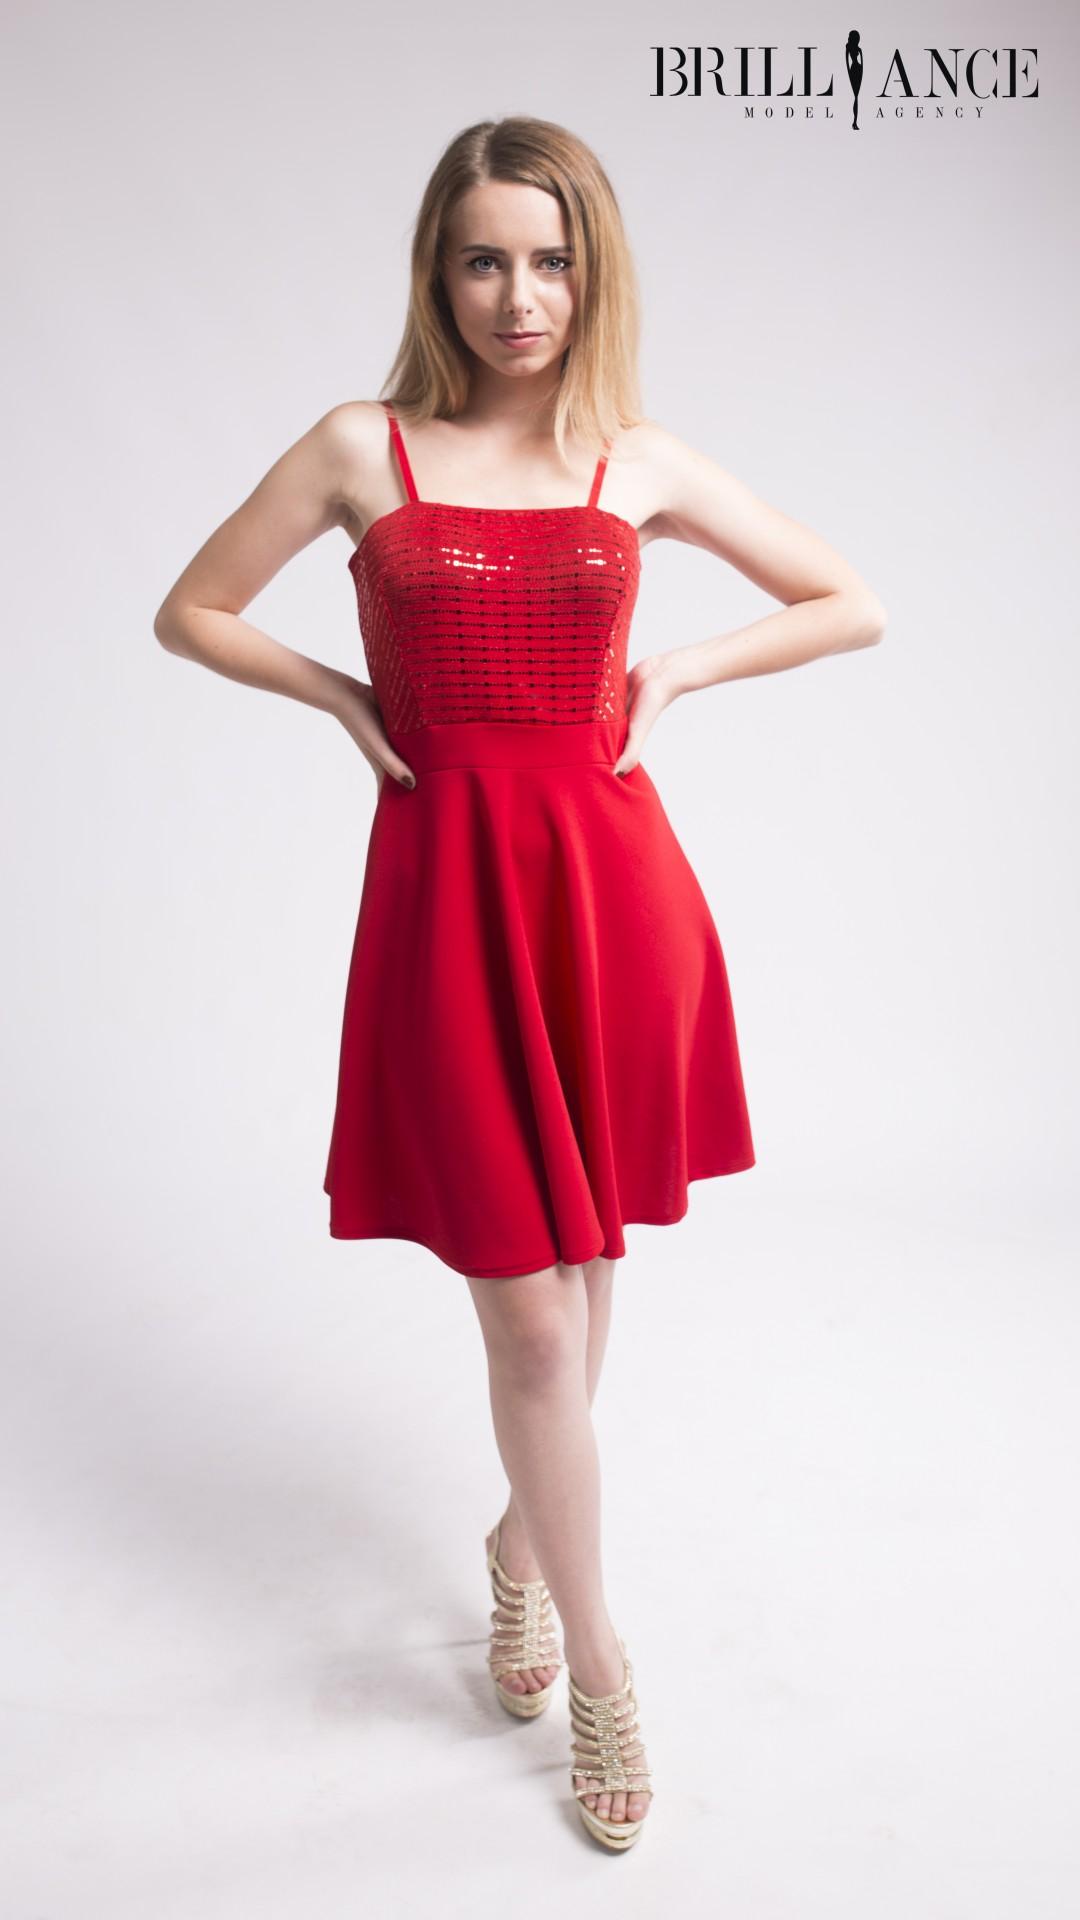 Nadiya 164 cm, 49 kg, 23 years | Brilliance Model Agency